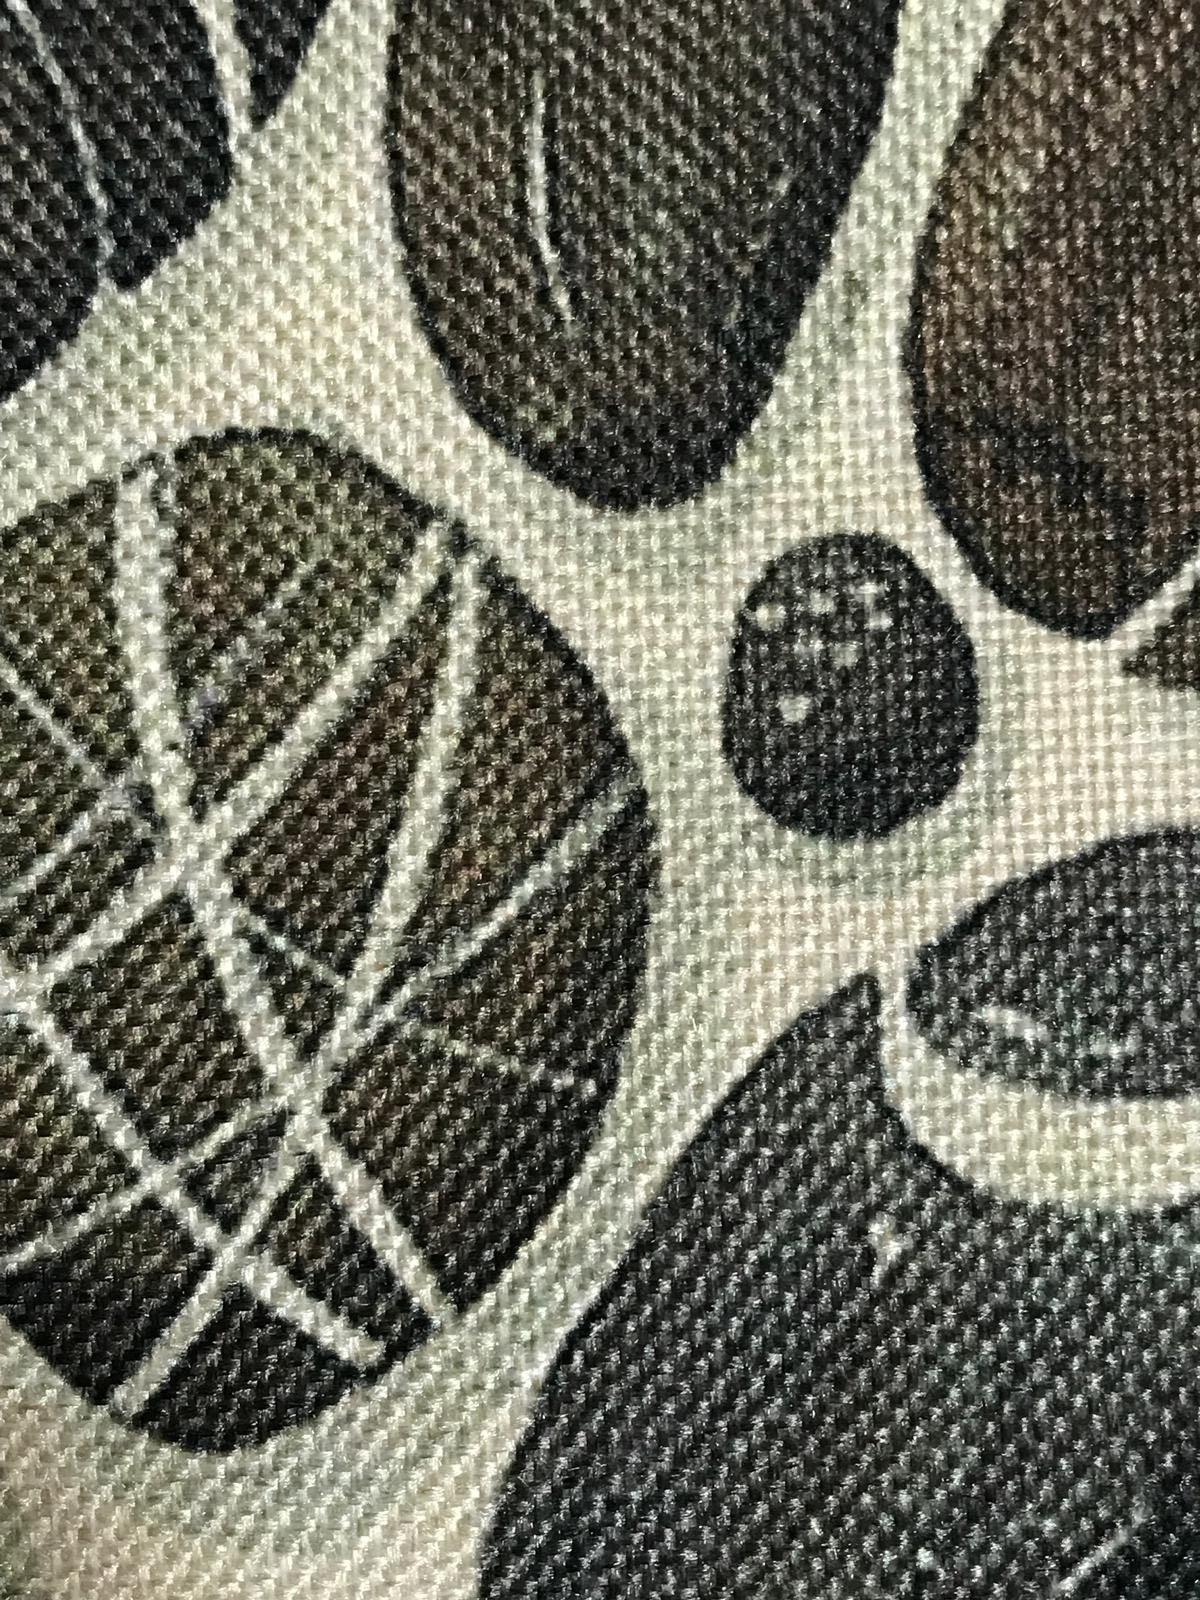 Linen Sofa Cushion Cover - Nature Series (SDJ-017)